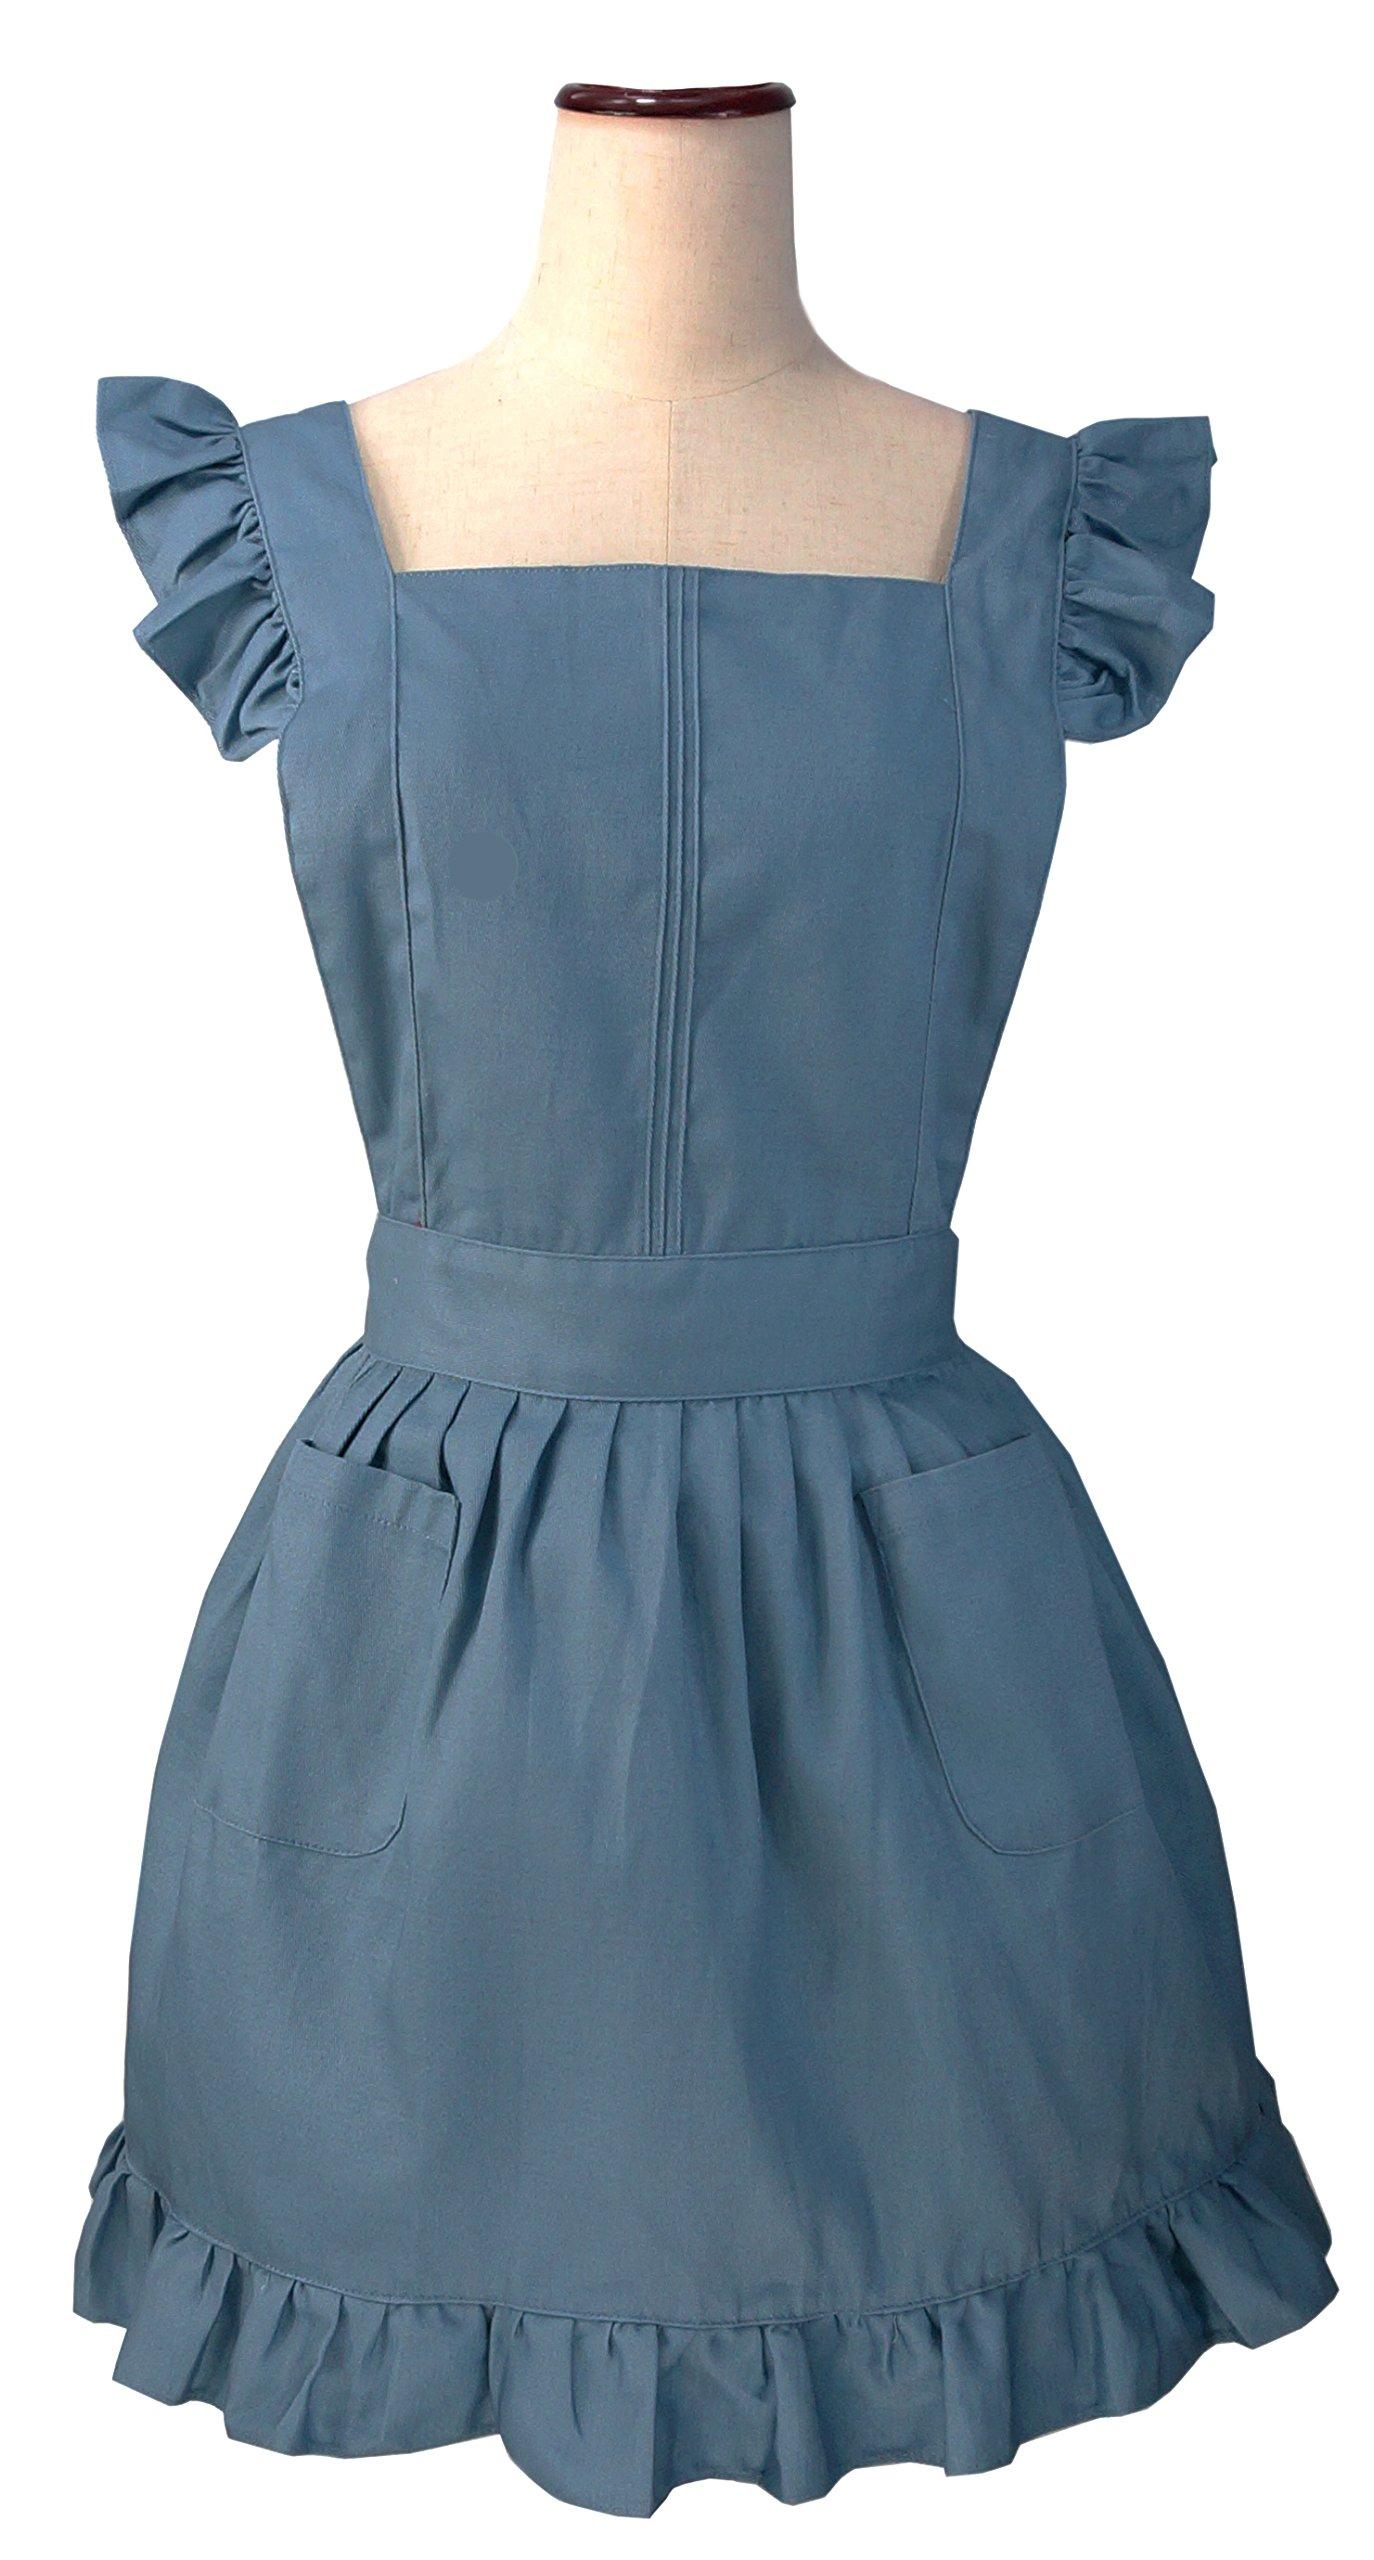 White ruffle apron amazon - Lilments Retro Adjustable Ruffle Apron Kitchen Cooking Baking Cleaning Maid Costume Blue